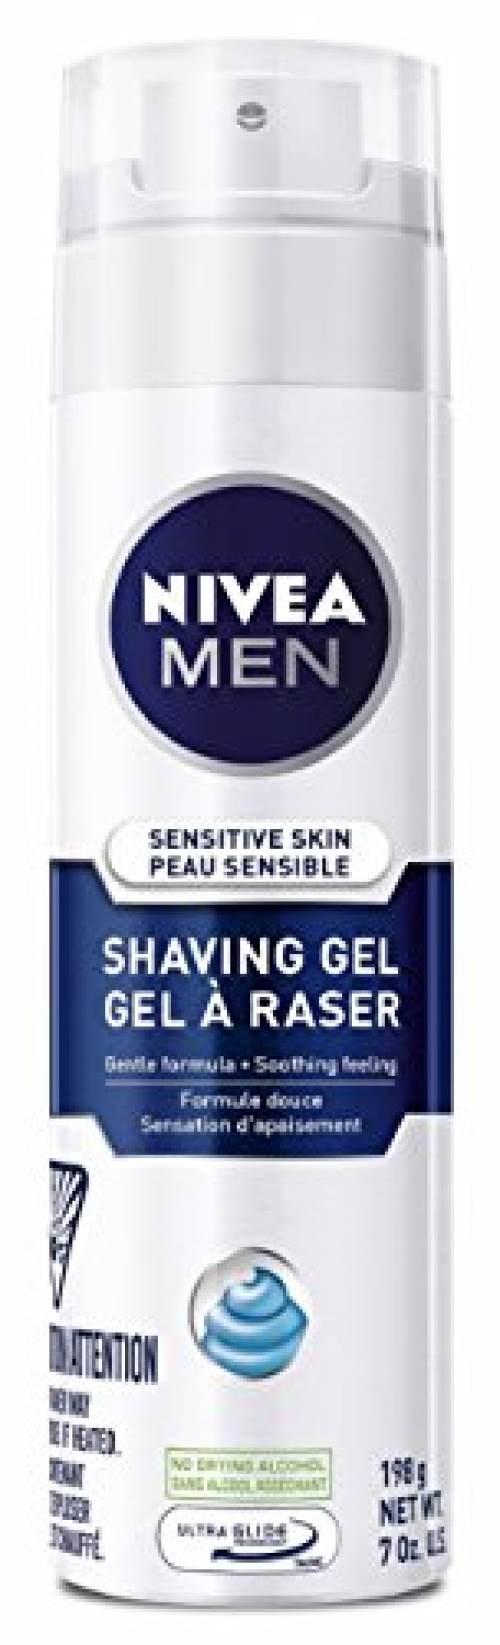 NIVEA MEN Sensitive Shaving Gel with Skin Guard